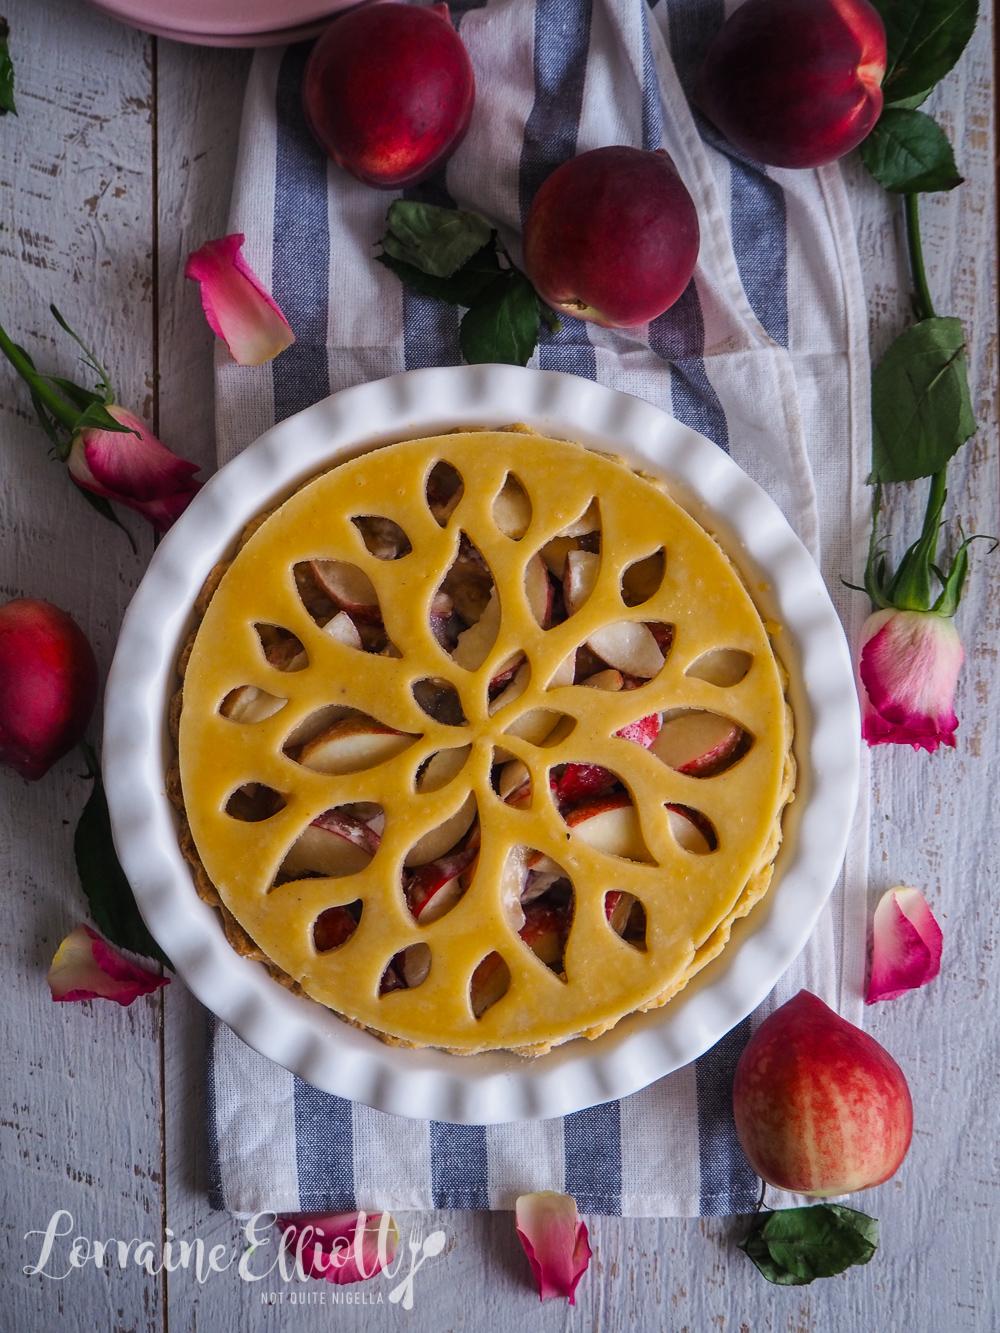 Patterned Peach Pie